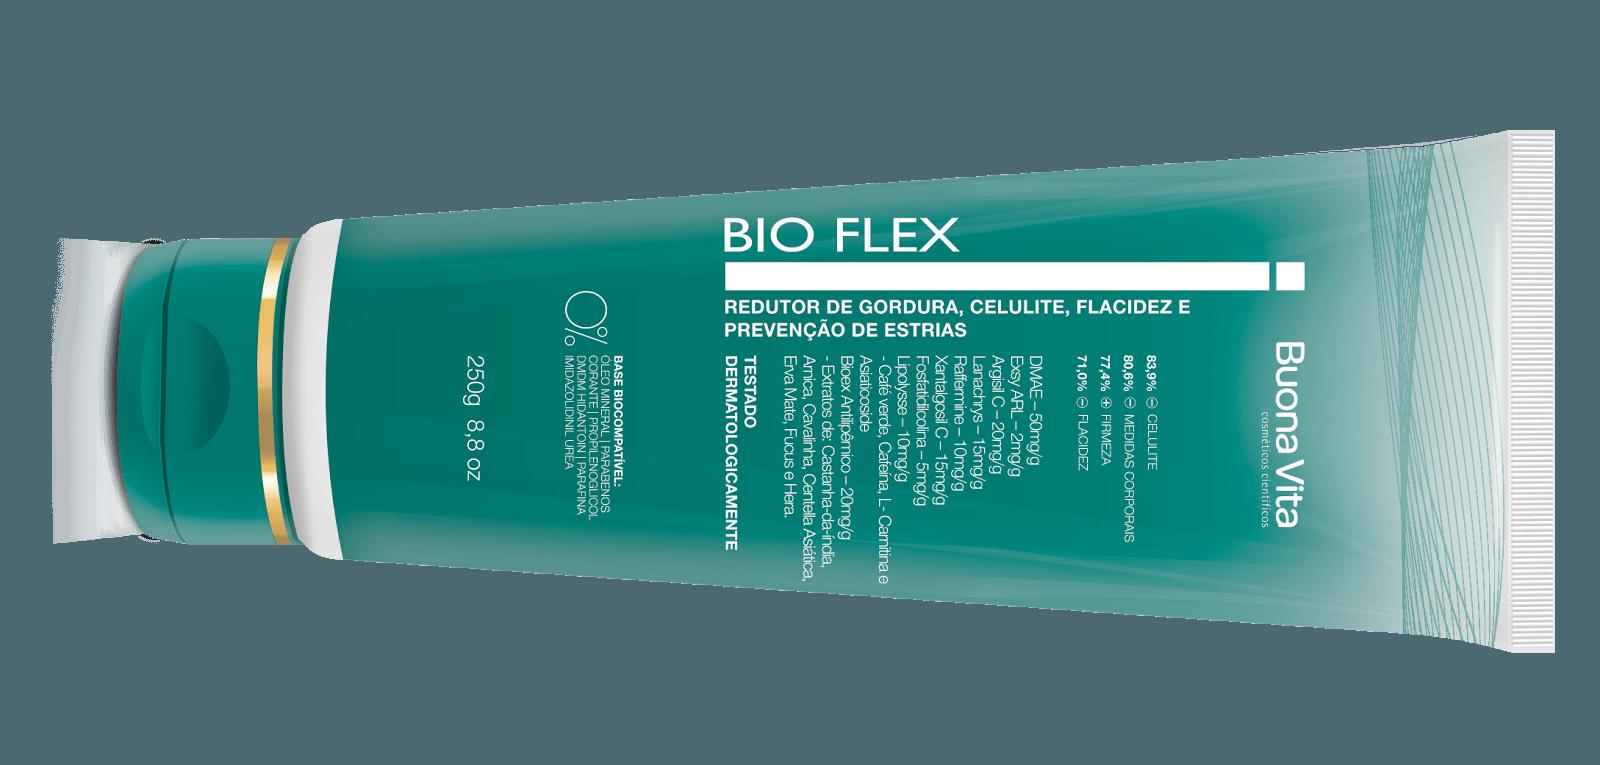 creme para perder barriga Bio Flex bouna vita